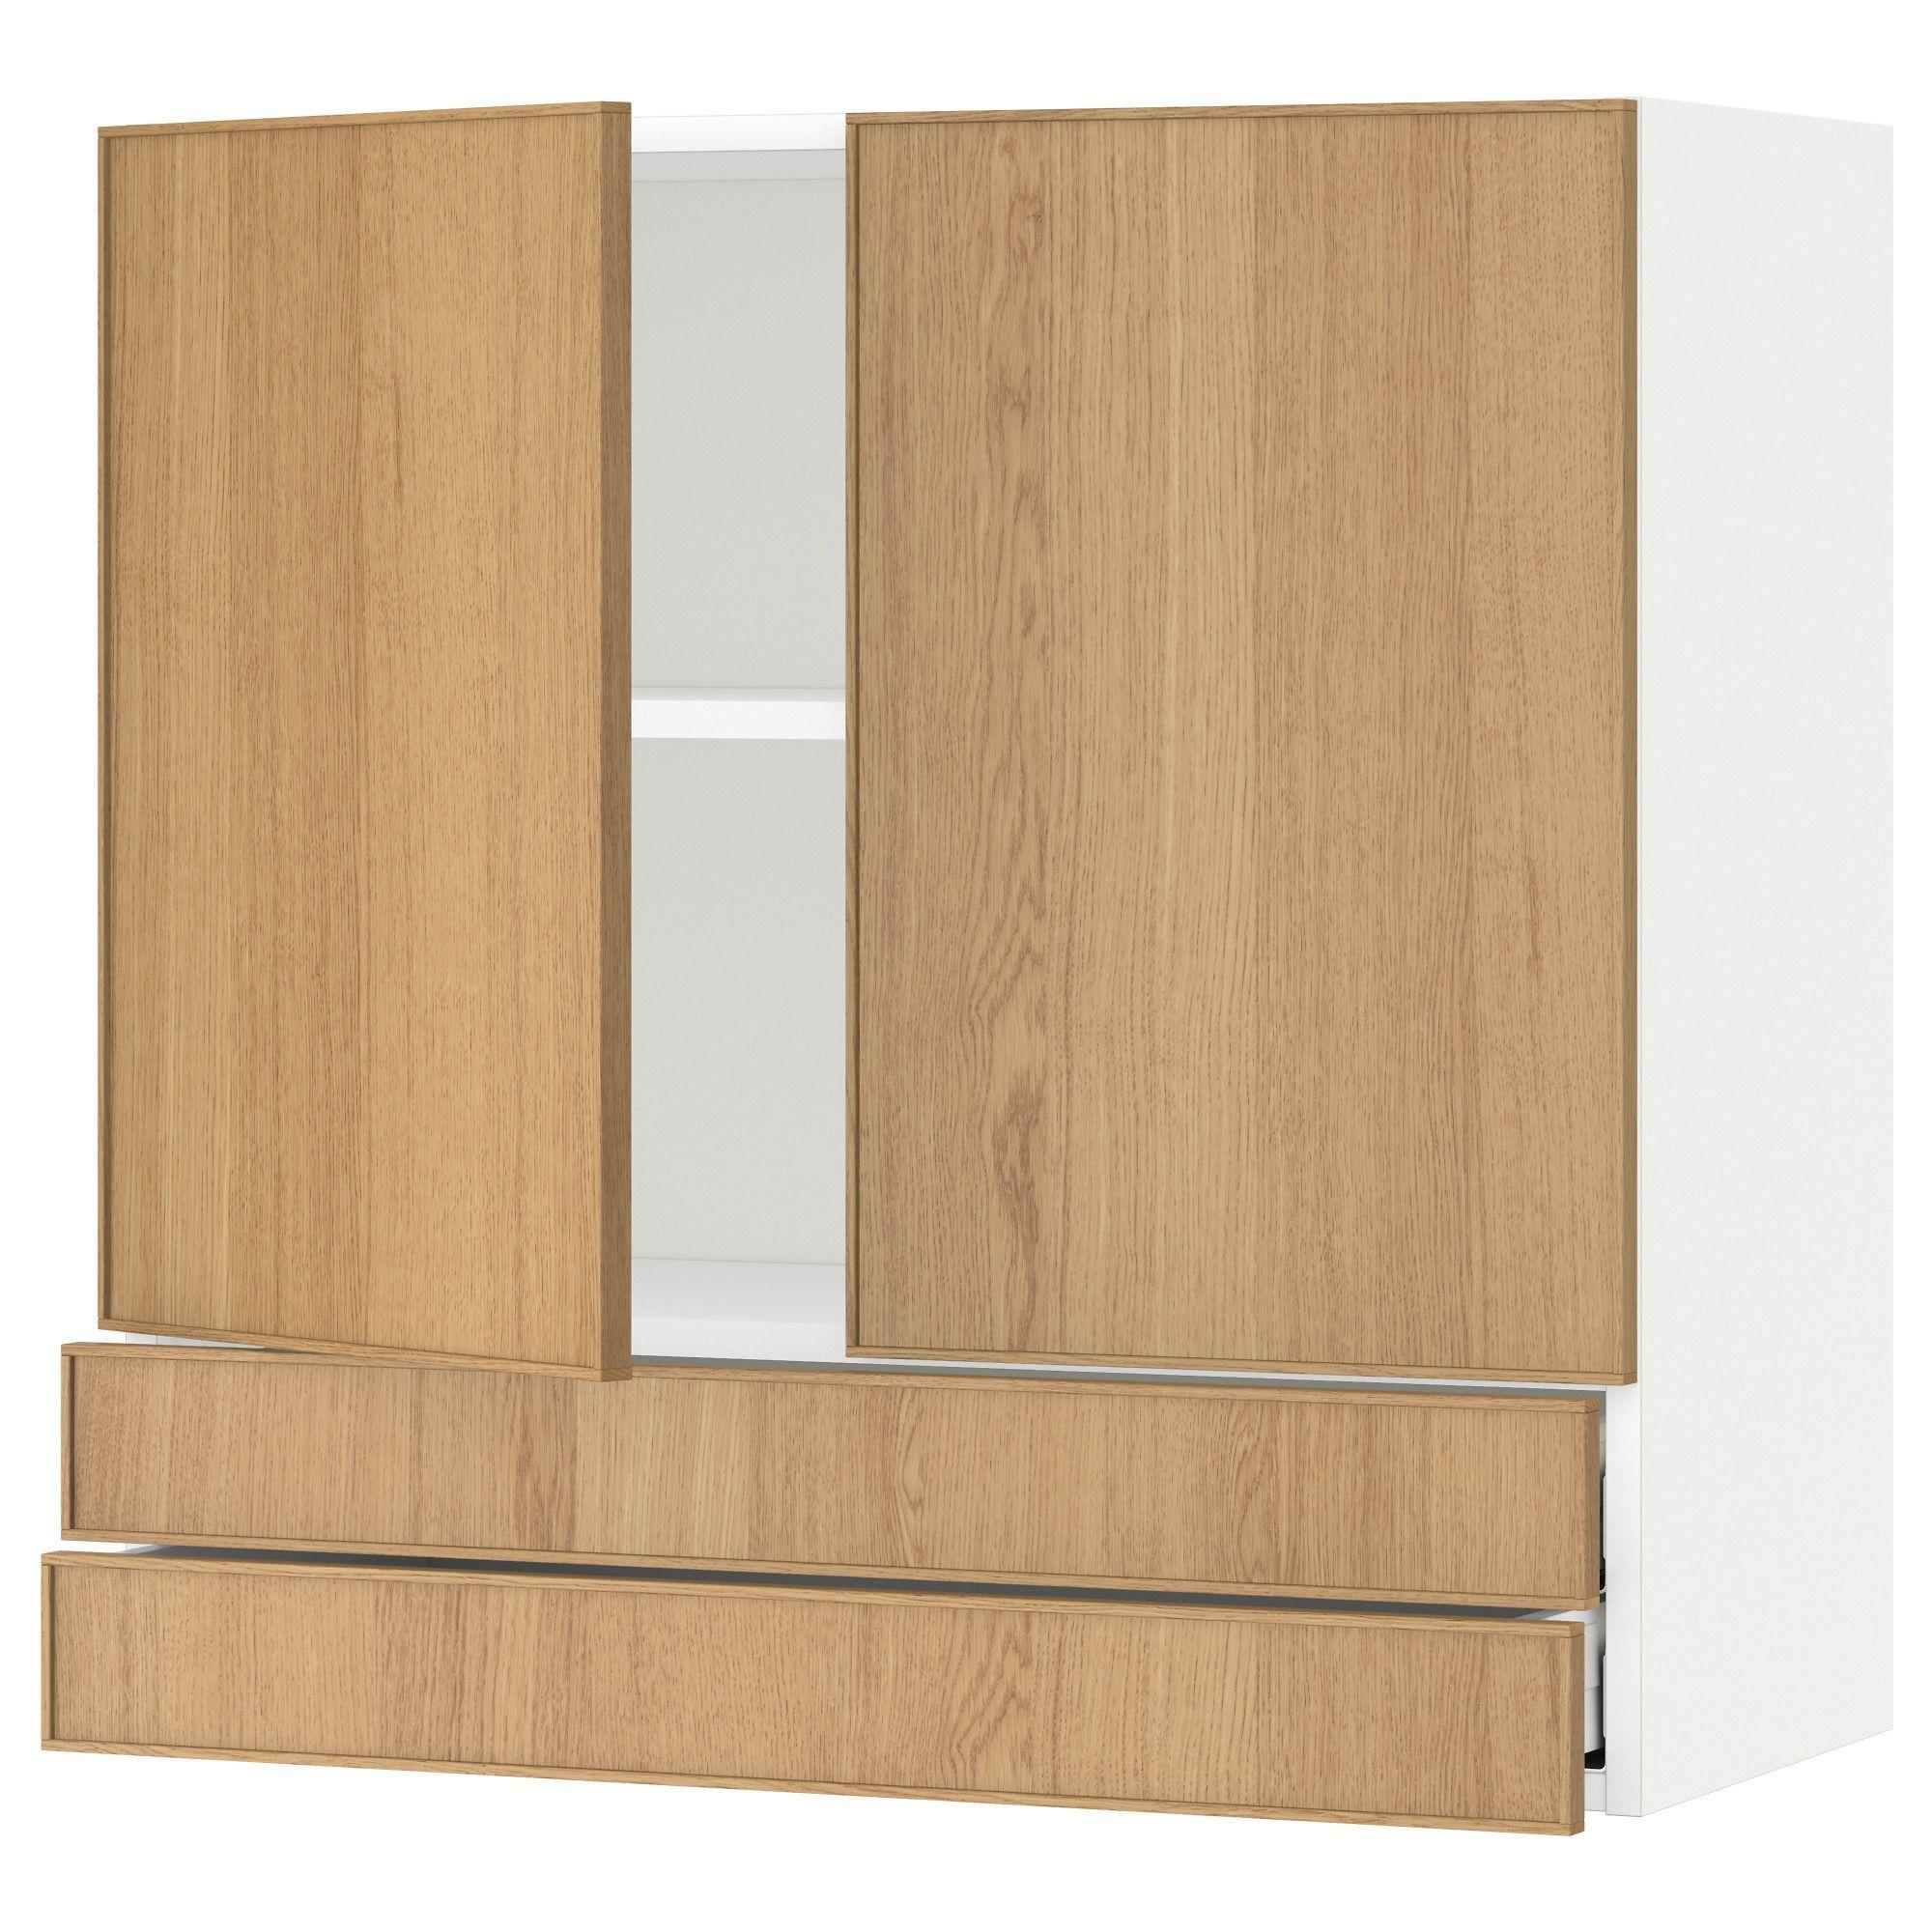 Kitchen Wall Cabinets Fm 5913 Cabinets Fm5913 Kitchen Wall In 2020 Kitchen Wall Cabinets Wall Cabinet Ikea Kitchen Wall Cabinets